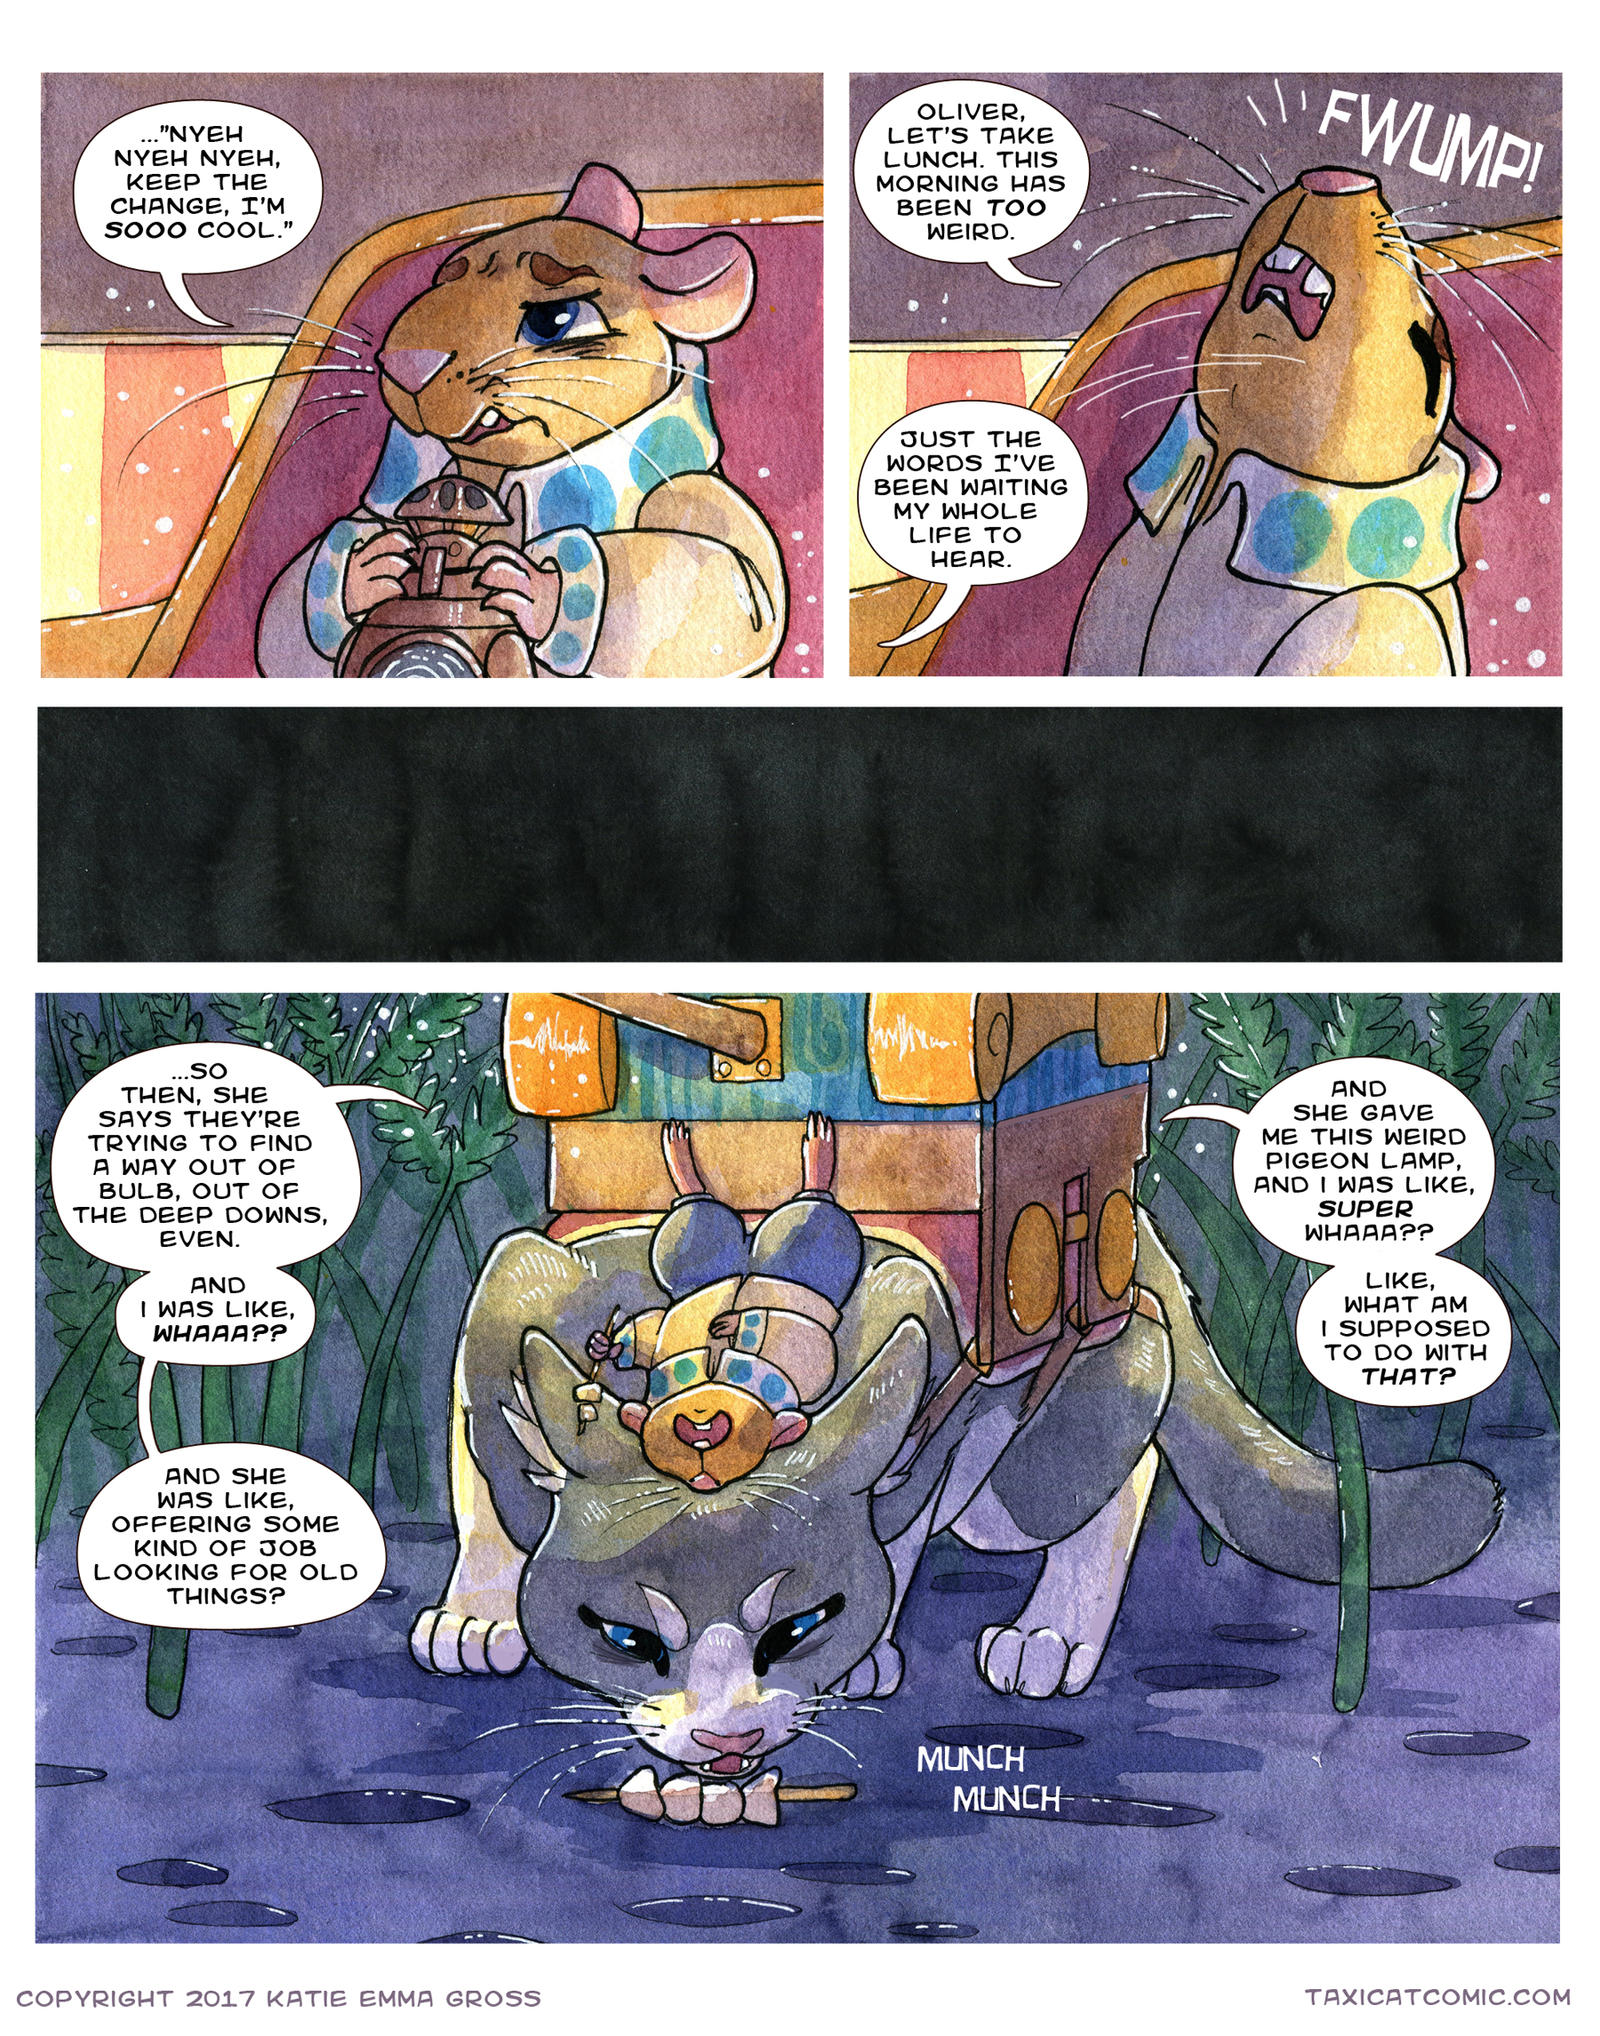 CH 1, Page 34- Whaaa by owlburrow